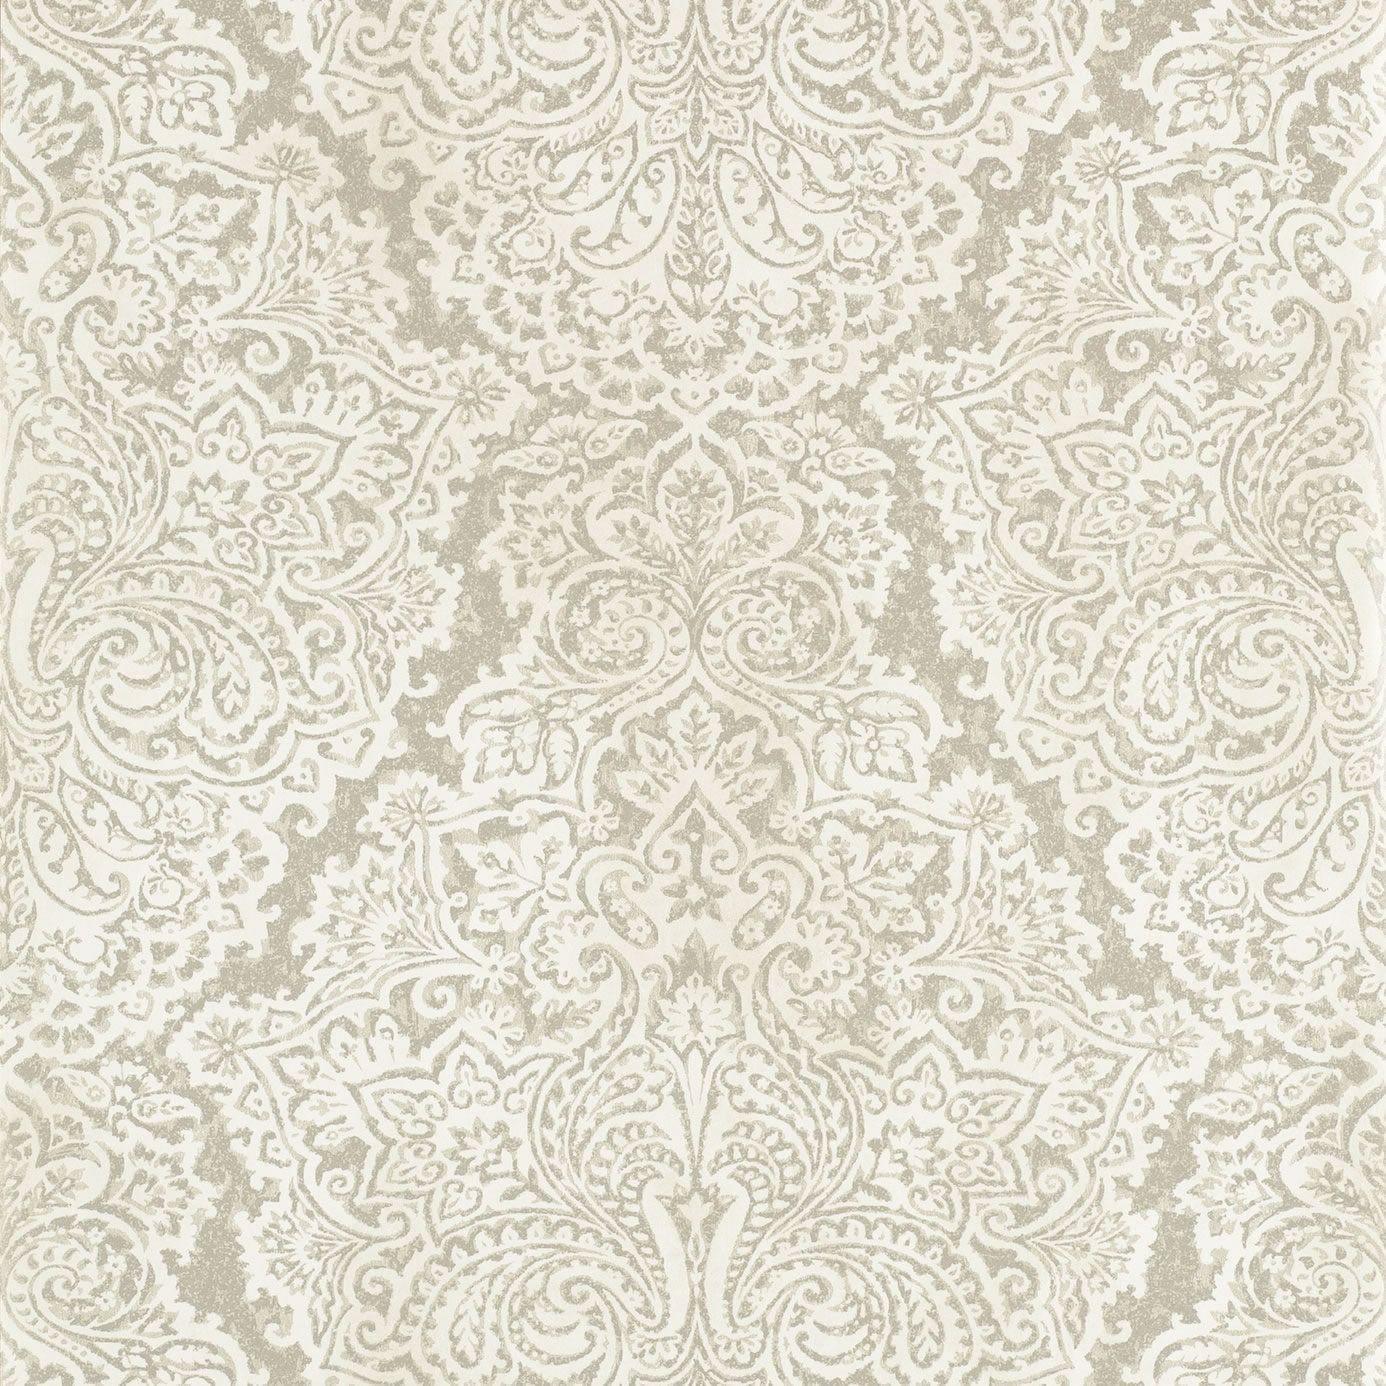 Decor Supplies White Gold   110640   Aurelia   Leonida   Harlequin 1386x1386